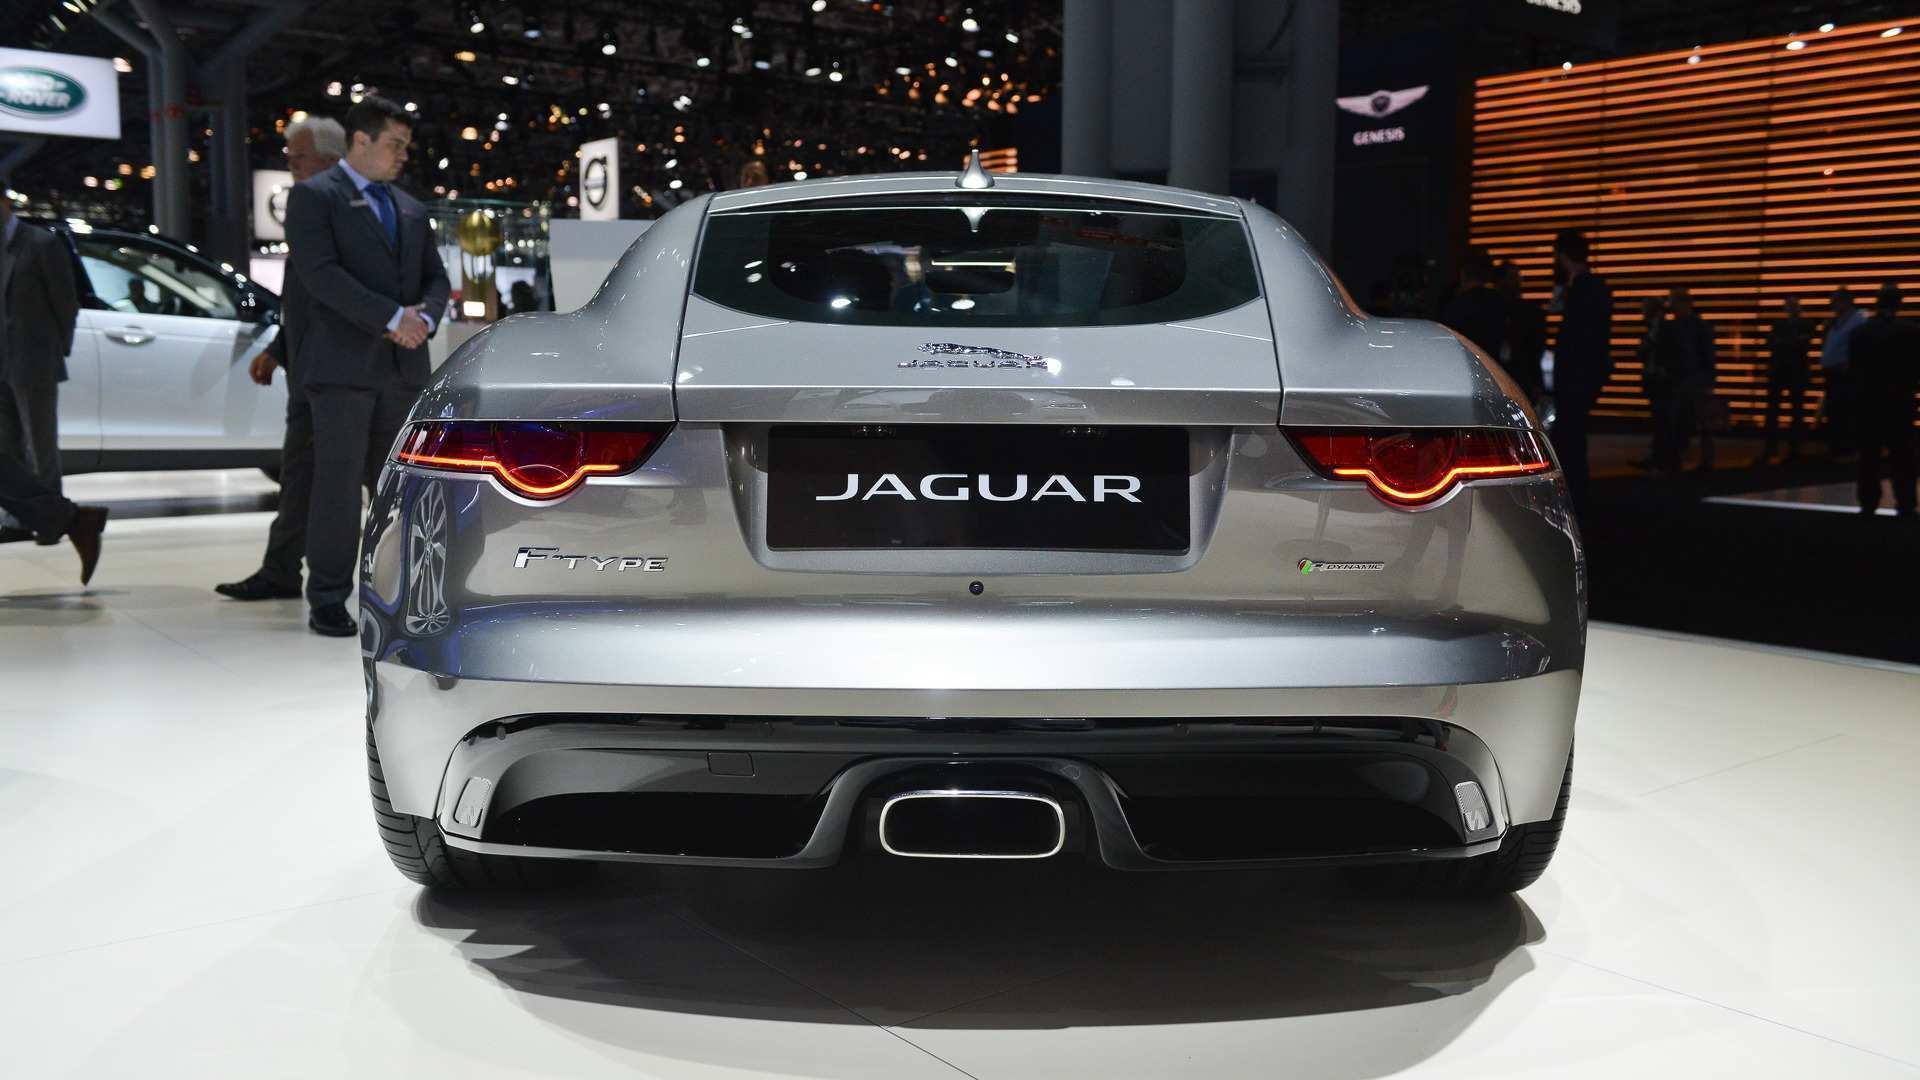 52 All New 2020 Jaguar F Type Exterior with 2020 Jaguar F Type